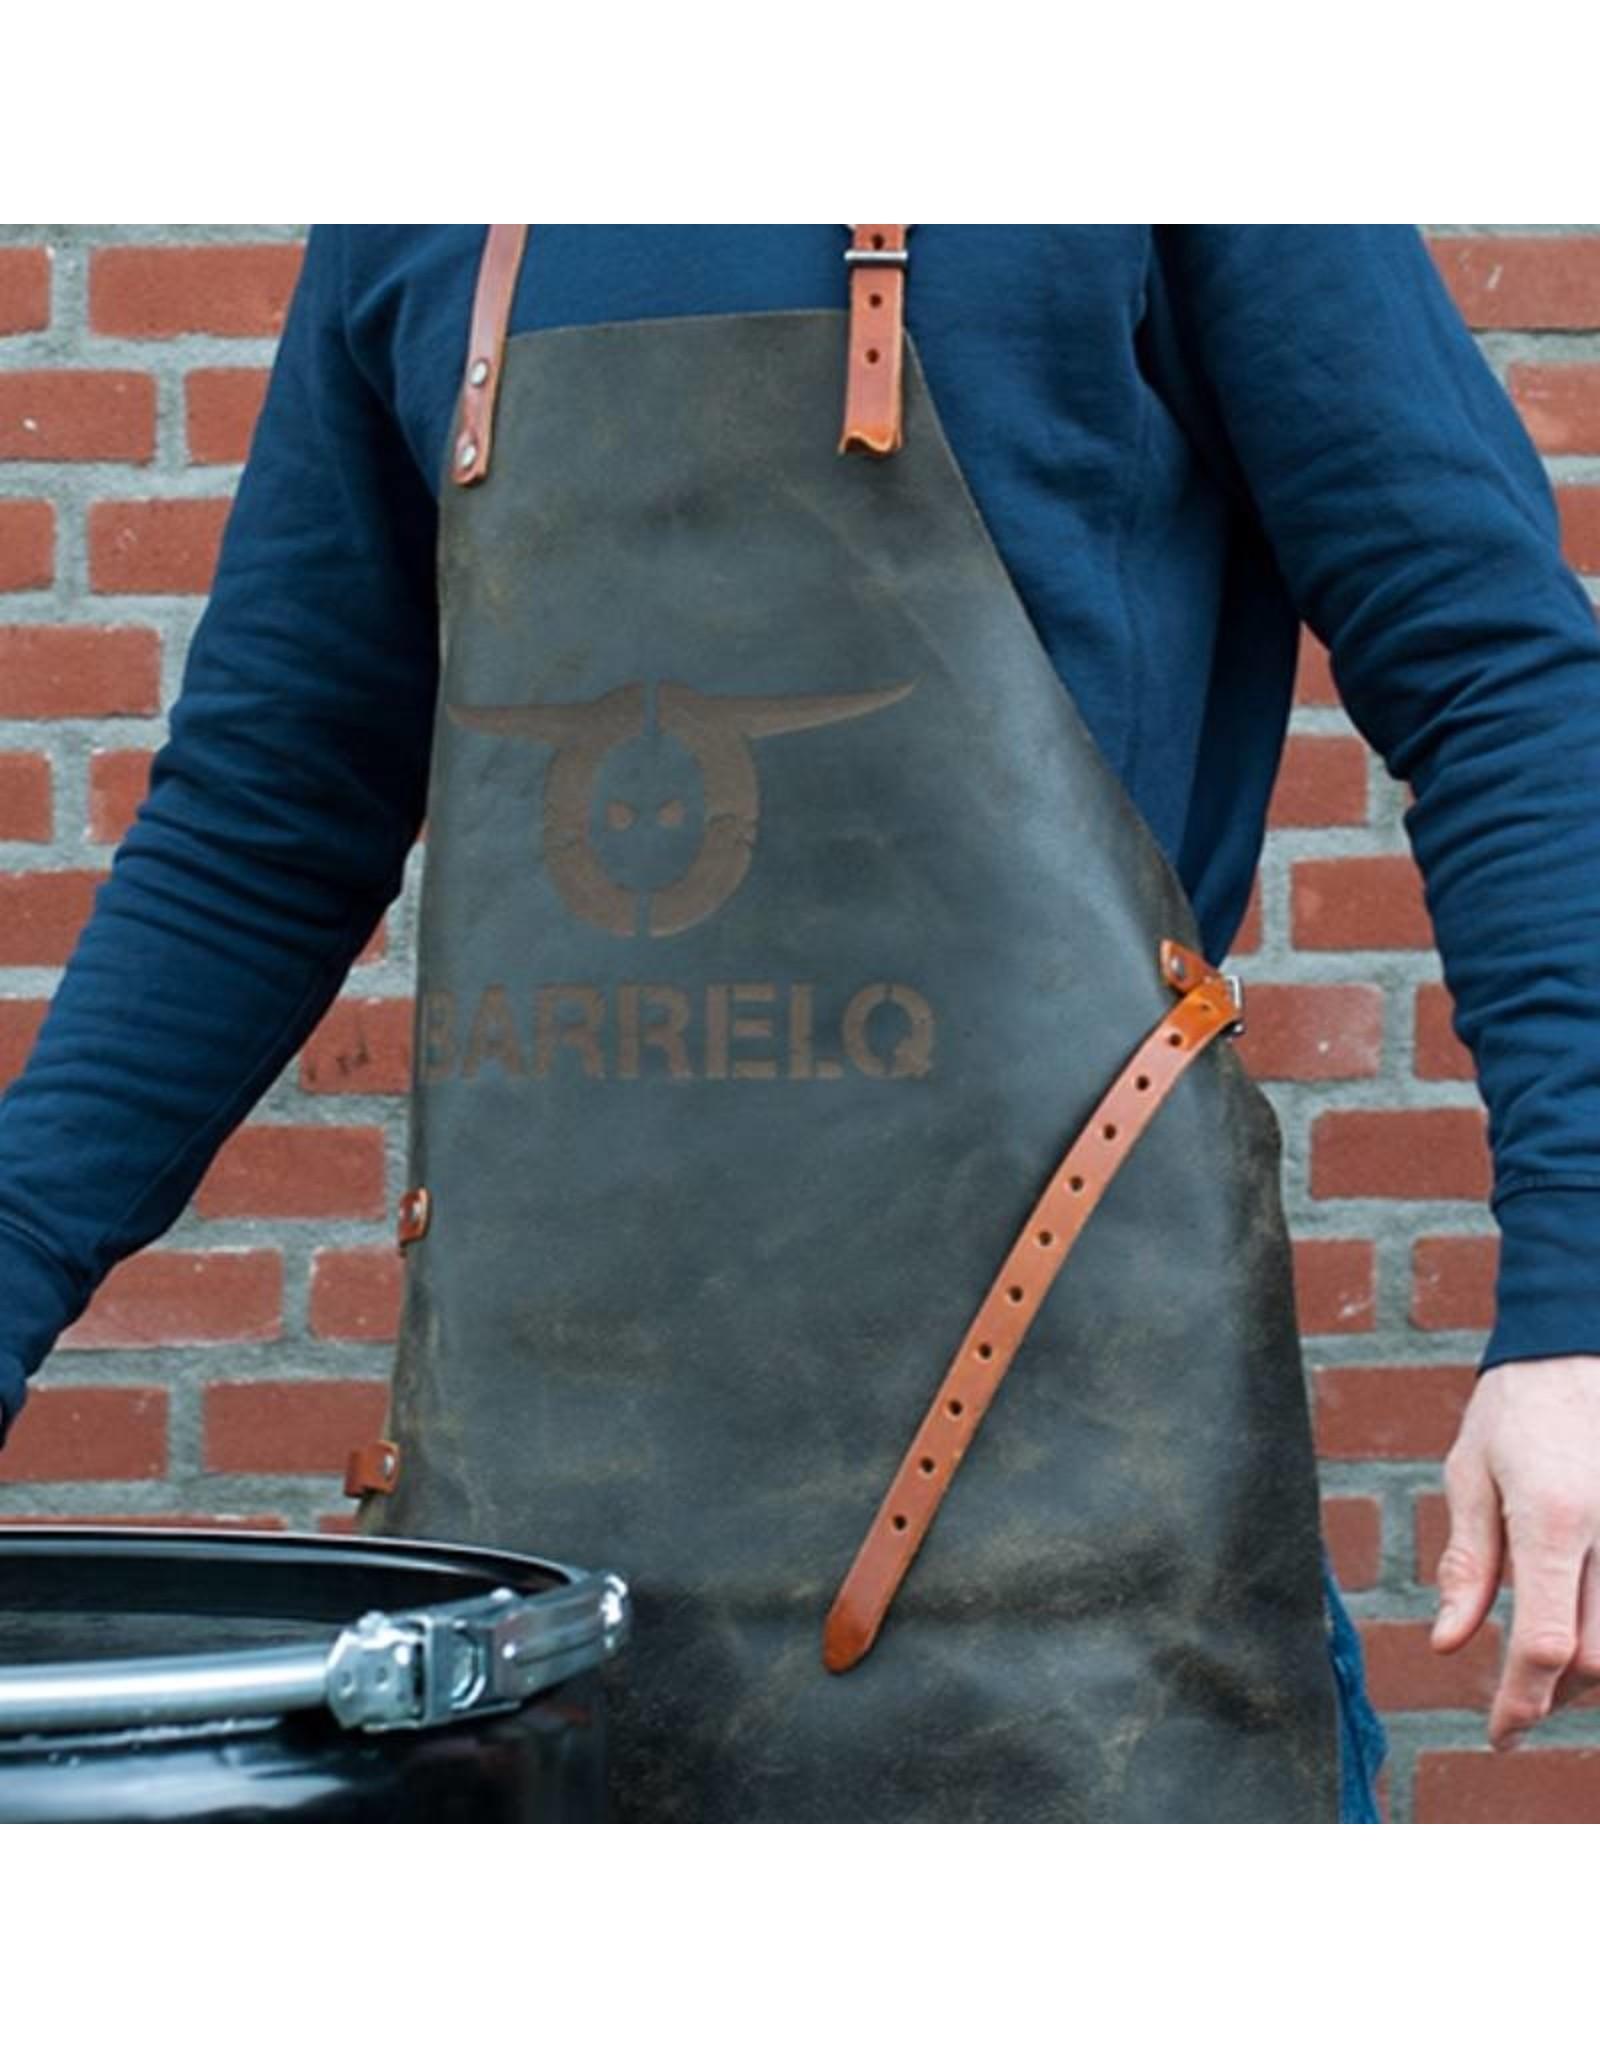 BarrelQ  BarrelQ Grillschürze Leder